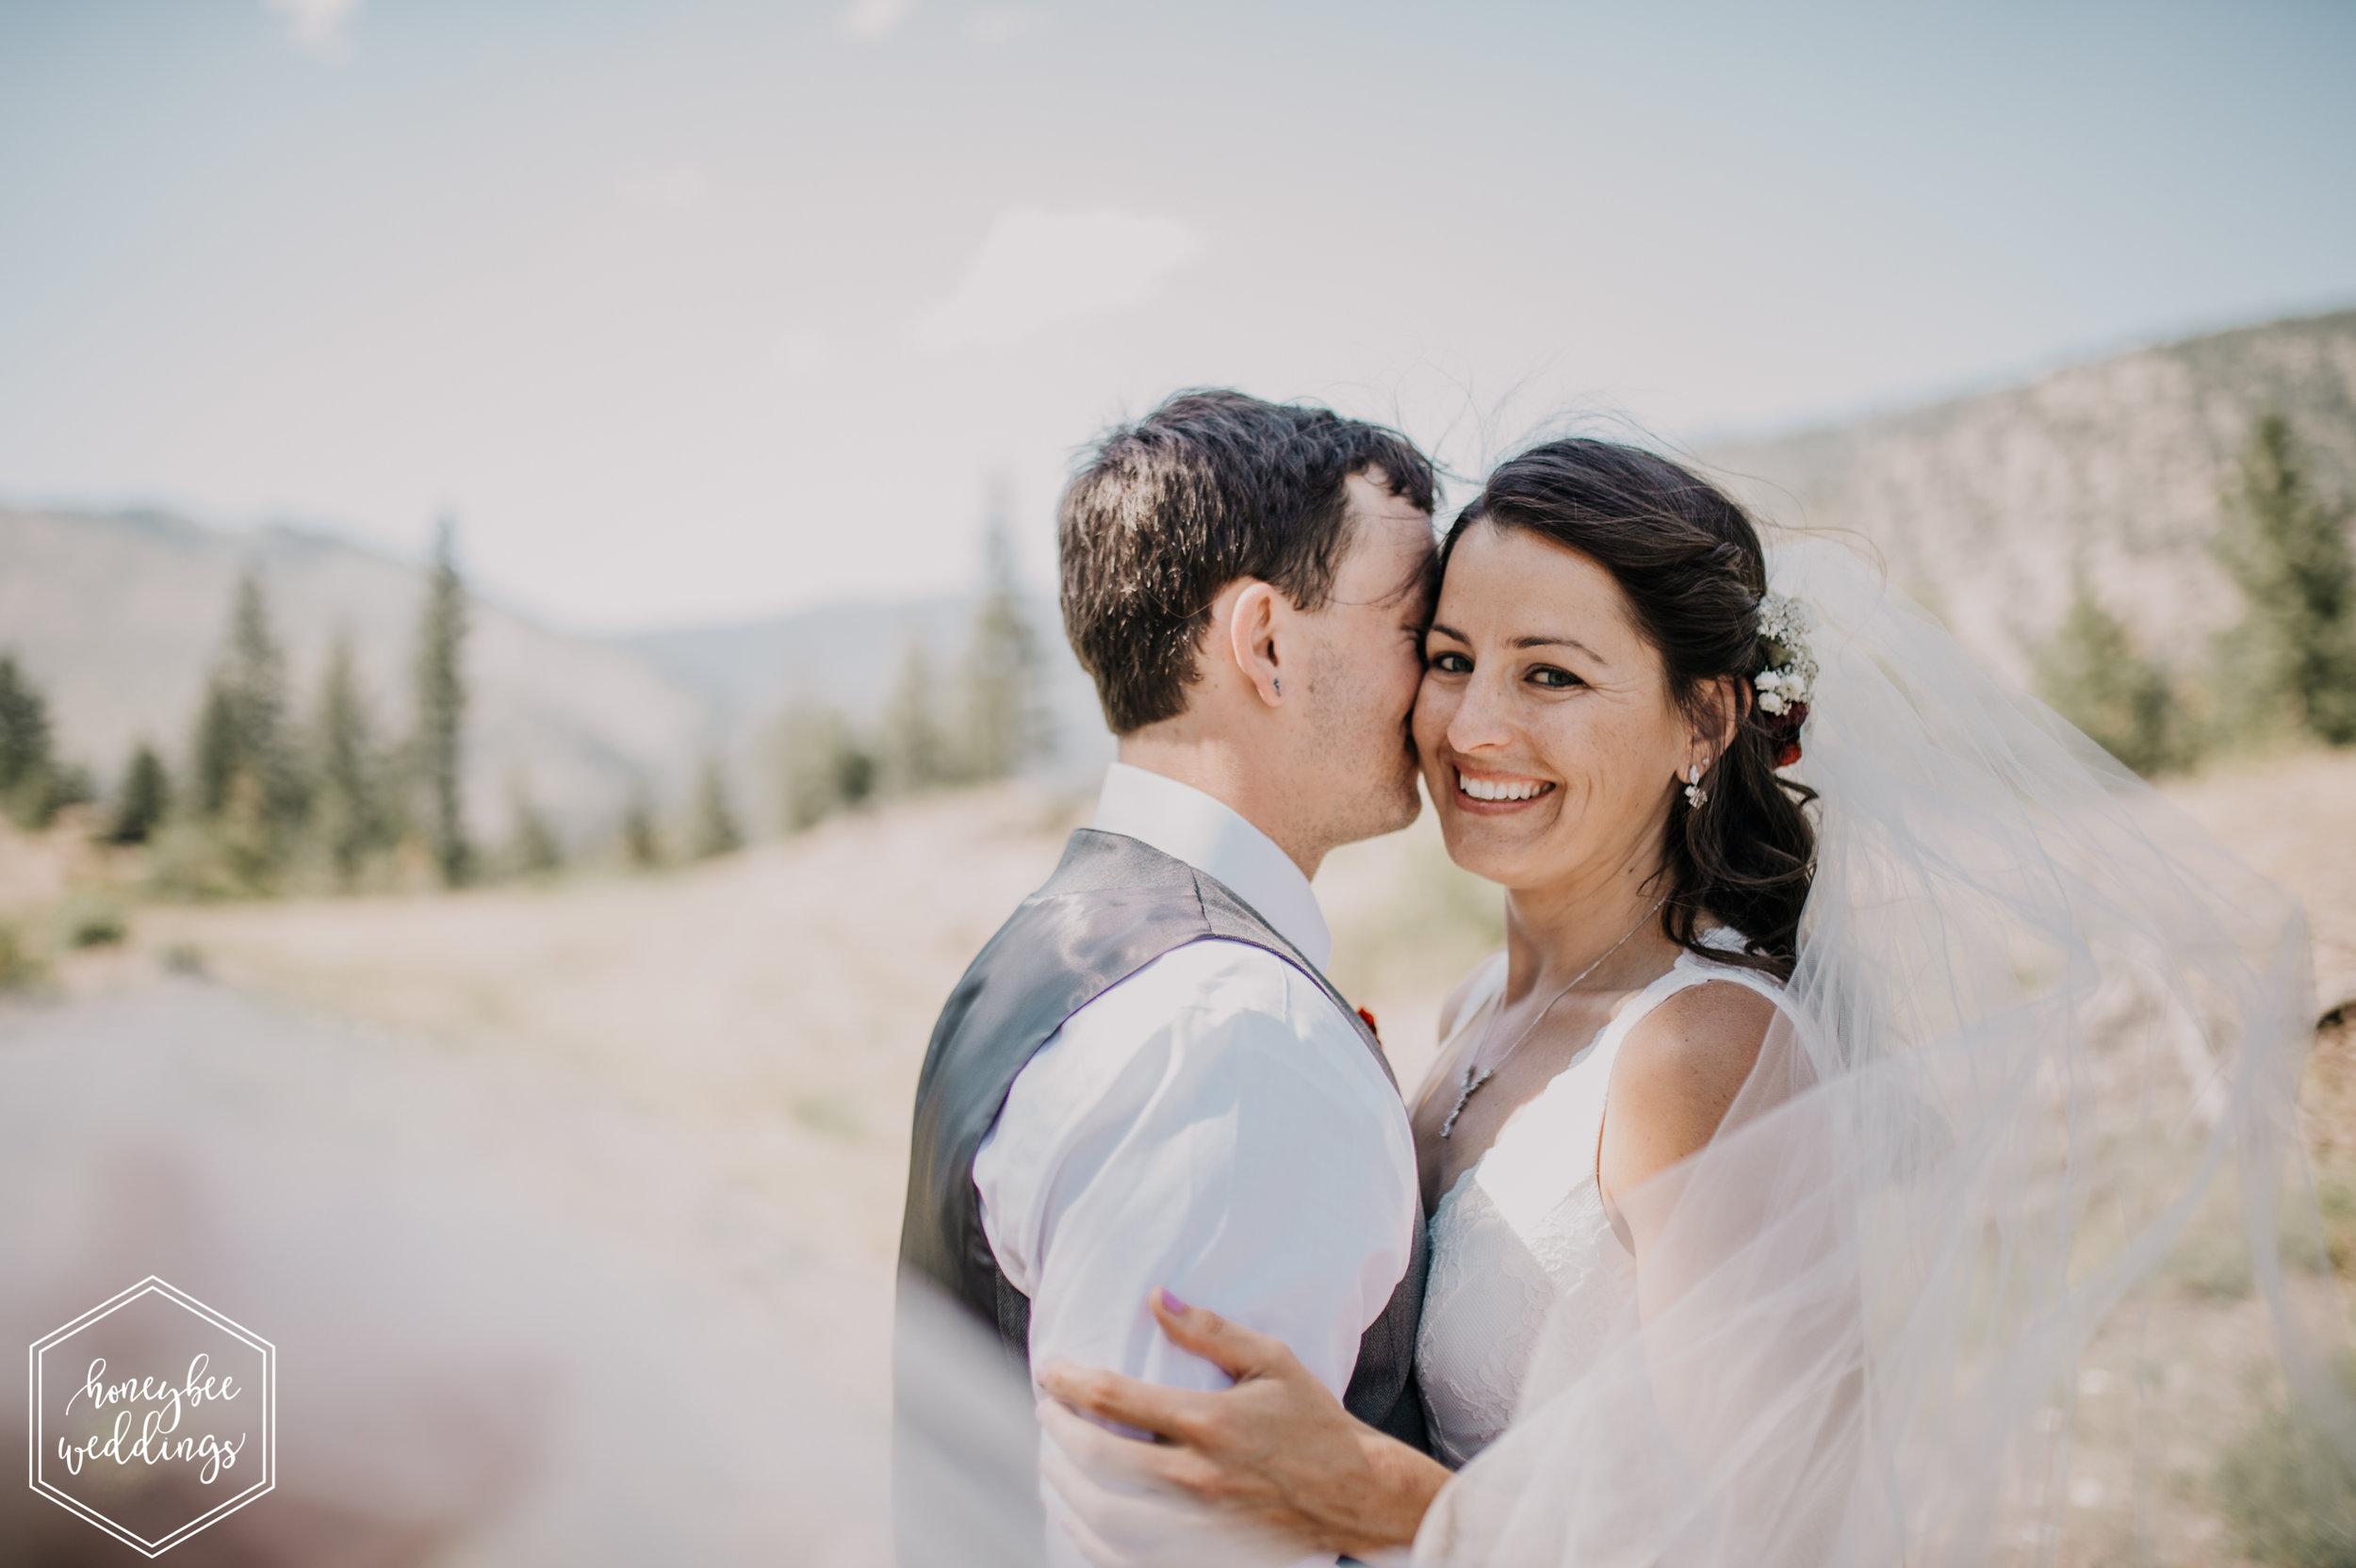 200 White Raven Wedding_Montana Wedding Photographer_Honeybee Weddings_ Meghan Maloney + Arza Hammond 2018-0134-2.jpg